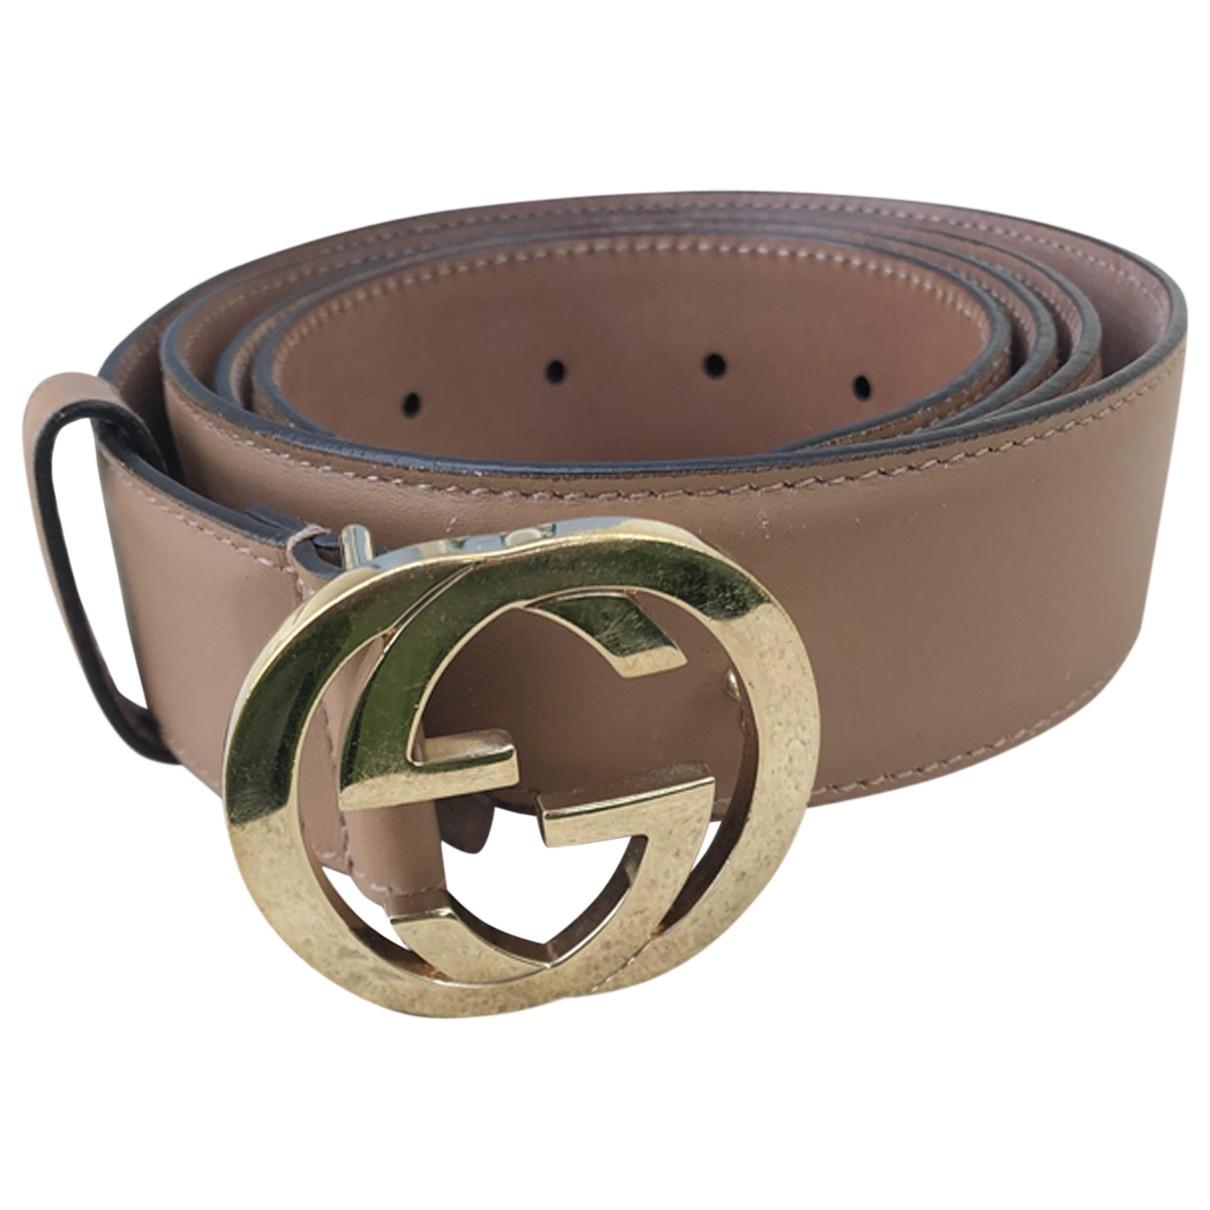 Gucci Interlocking Buckle Beige Leather belt for Women M International